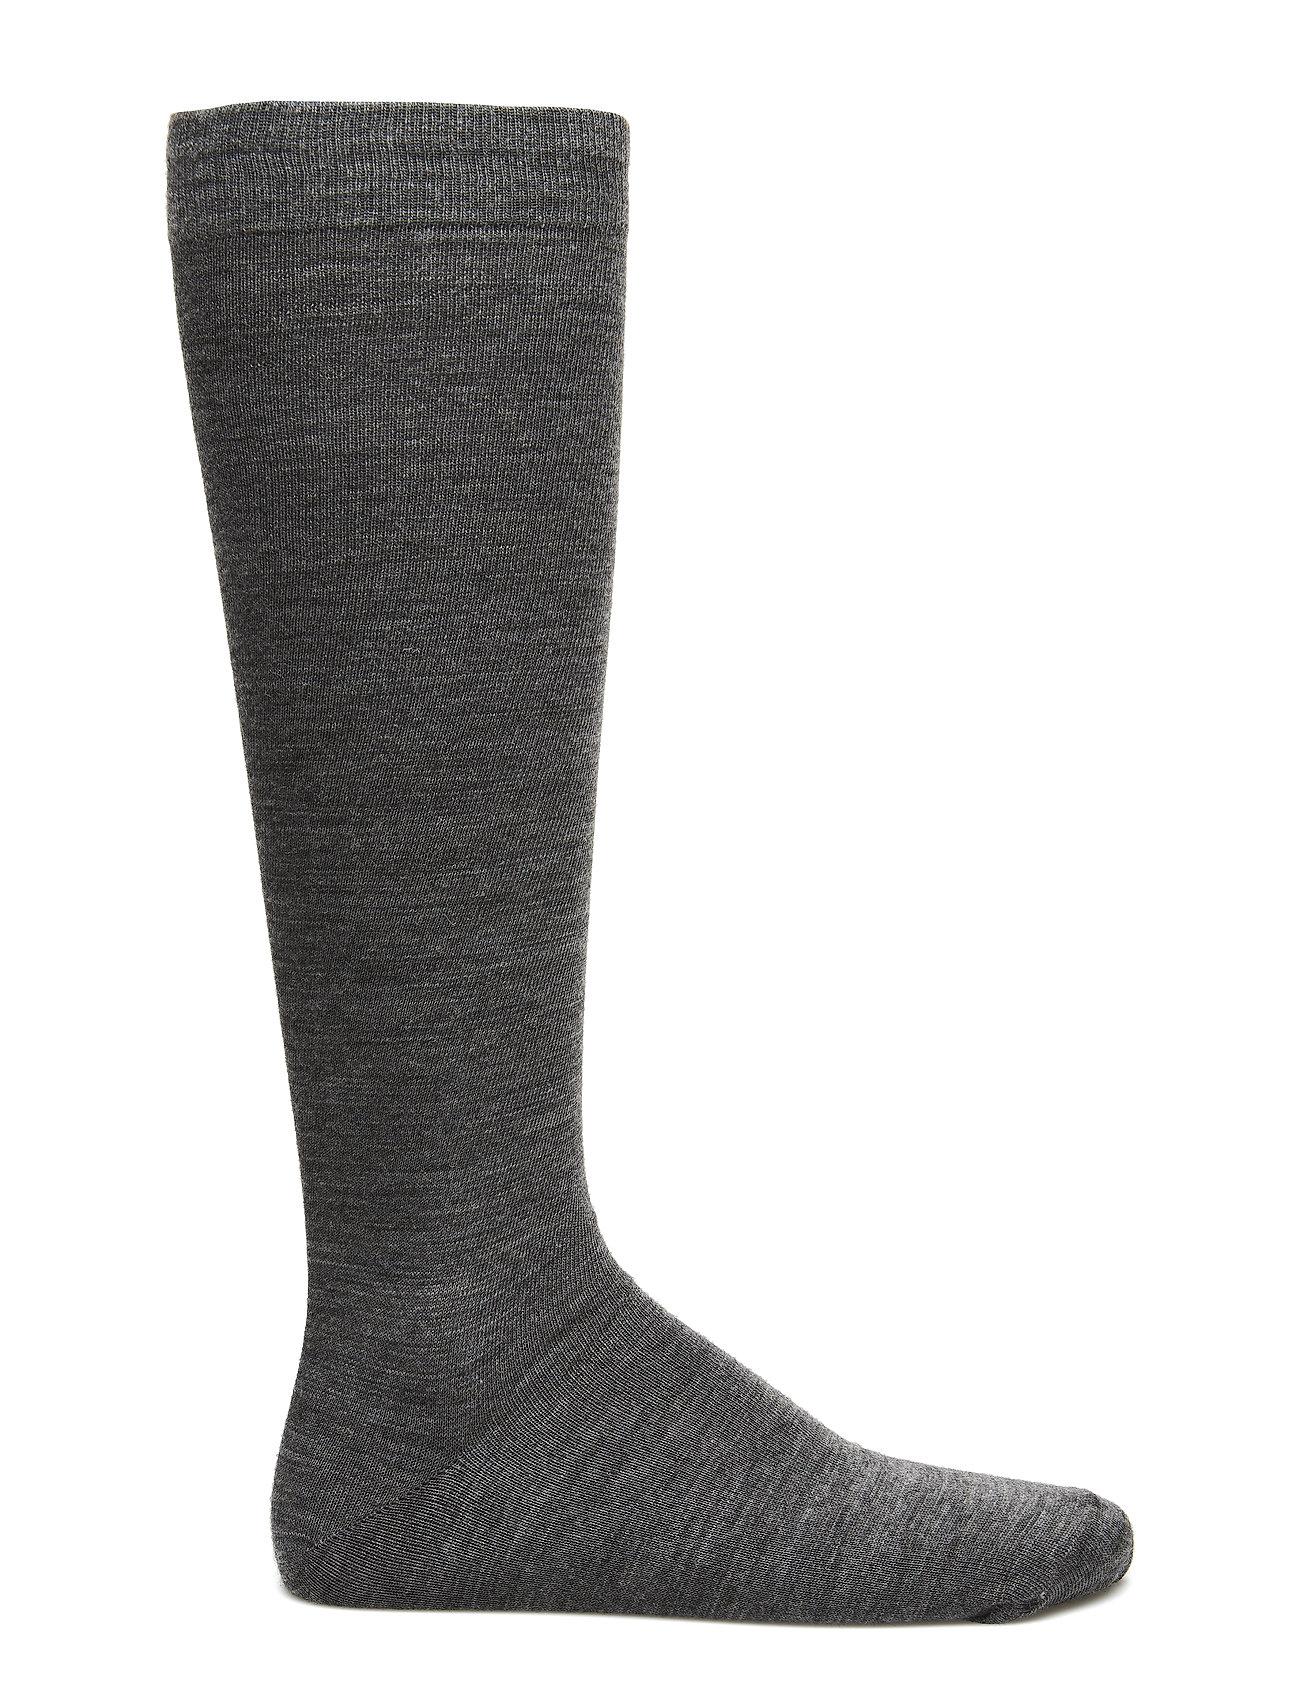 Kneehighgrey Egtved Socks Twin Mel Egtved Kneehighgrey Twin Socks Egtved Mel Socks Kneehighgrey Twin 2EDH9I